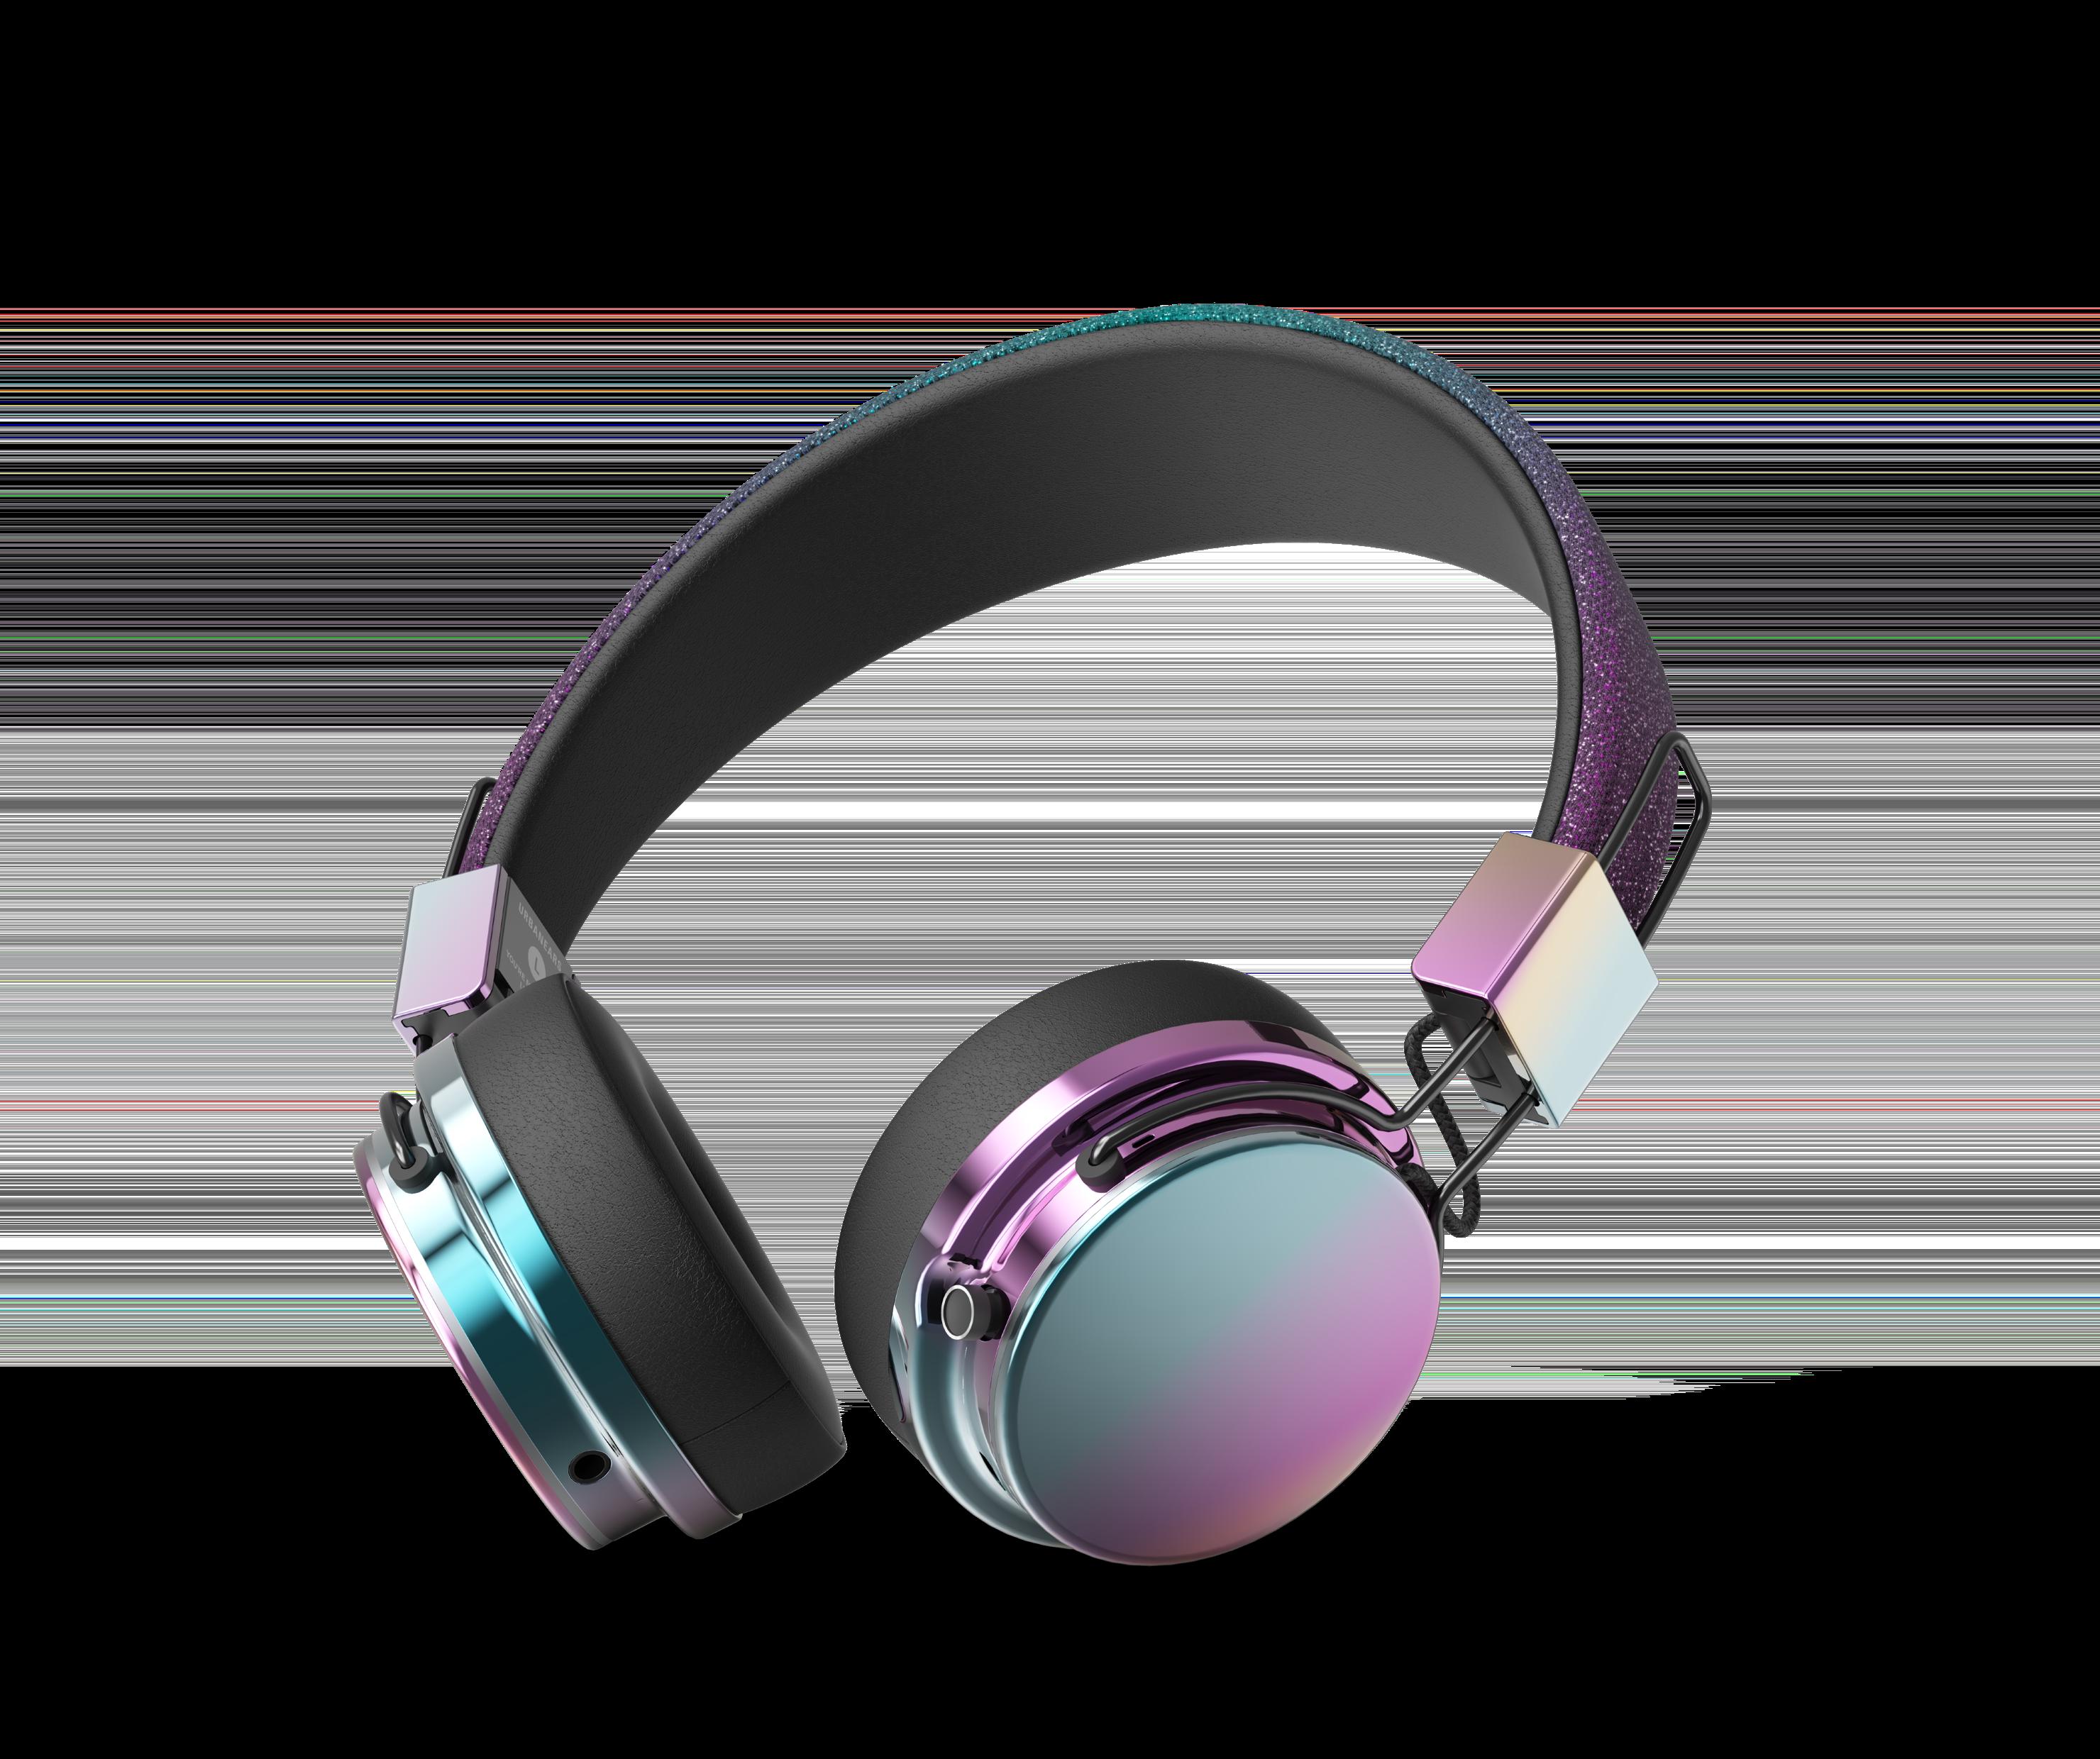 280d4dbcdefac Plattan 2 Bluetooth Tove Lo Edition